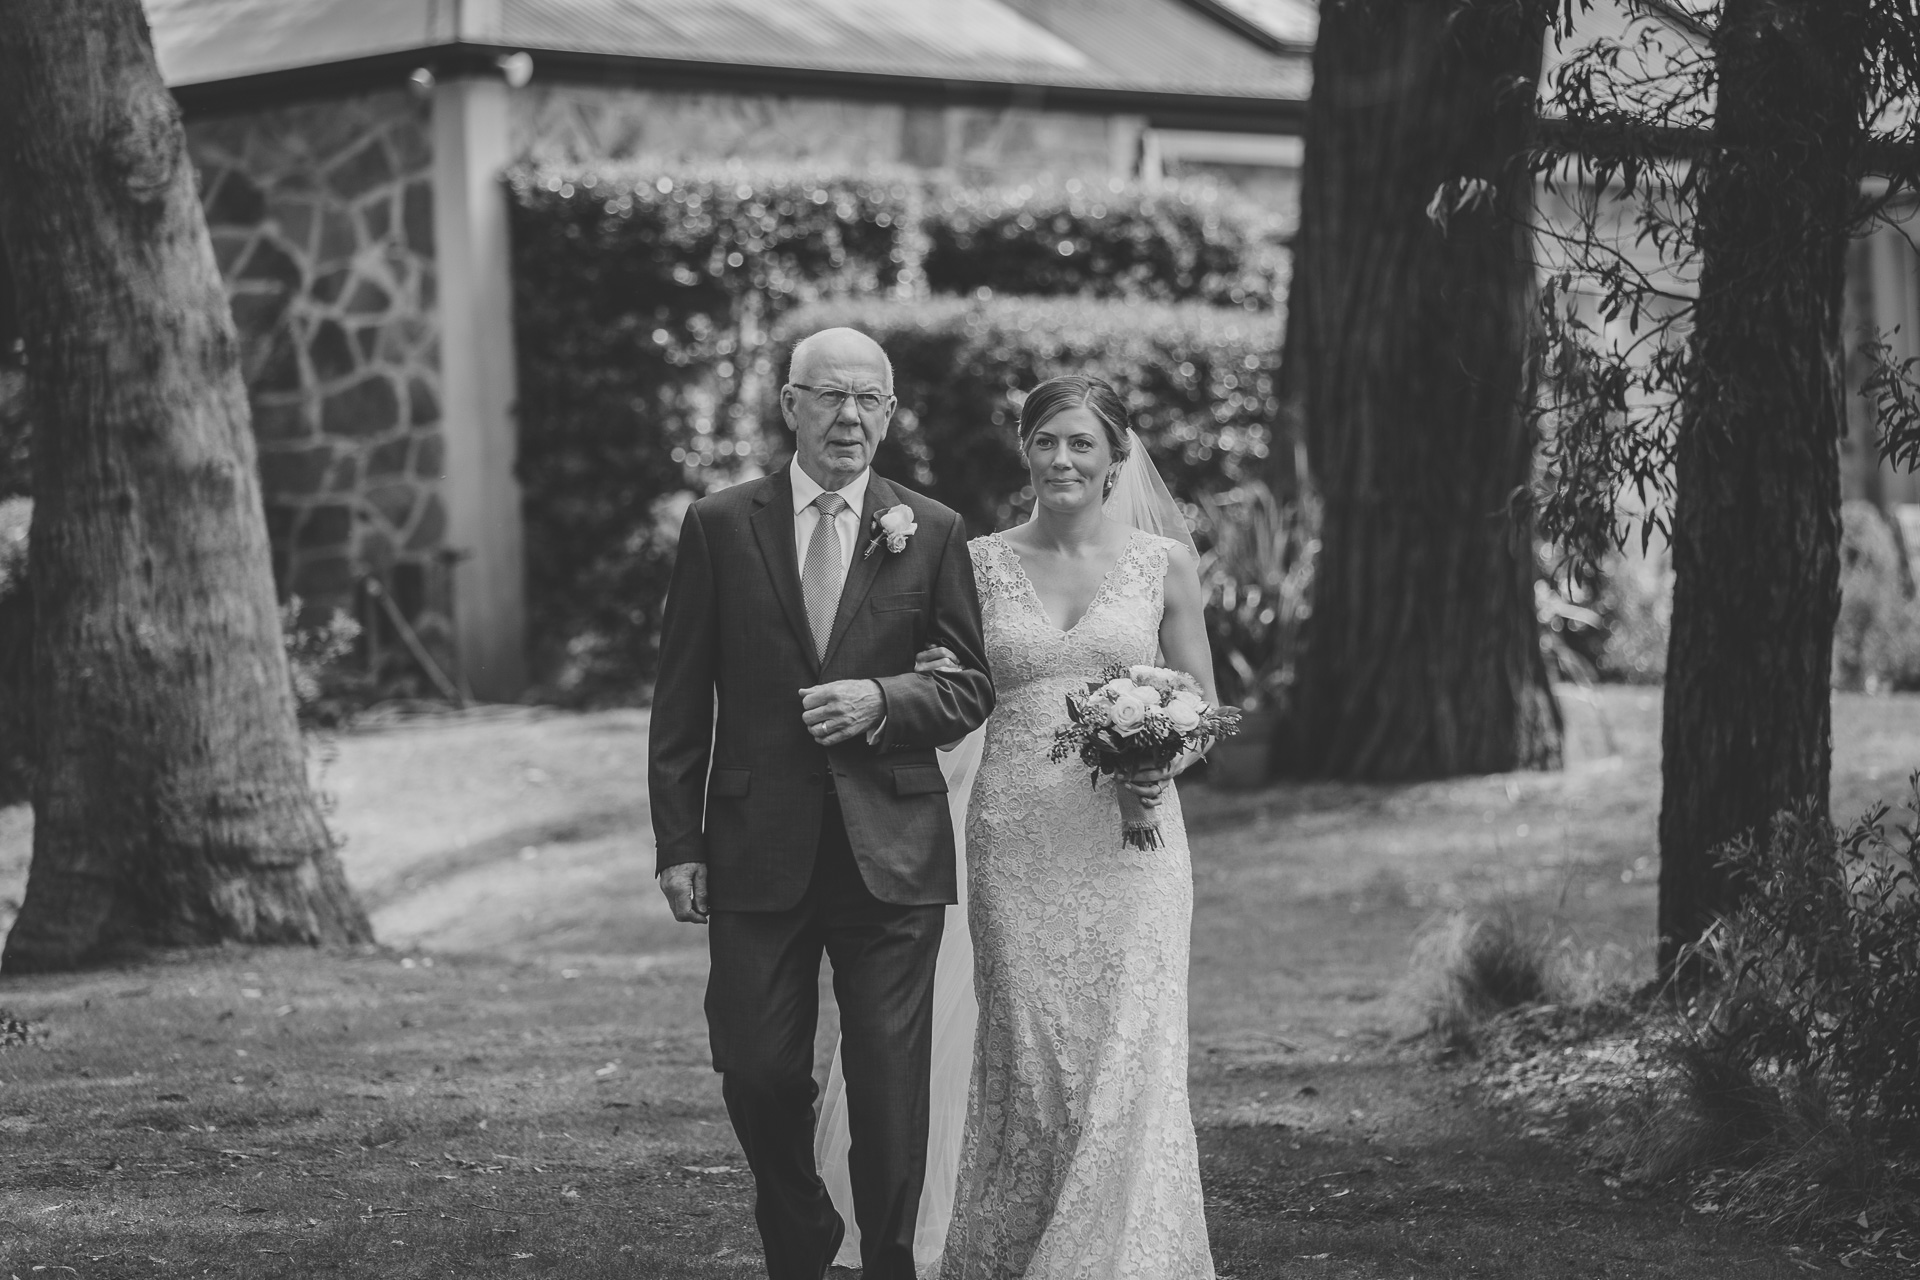 20161112 - Heath_Ruth_Wombat_Hollow_Wedding | 095.jpg